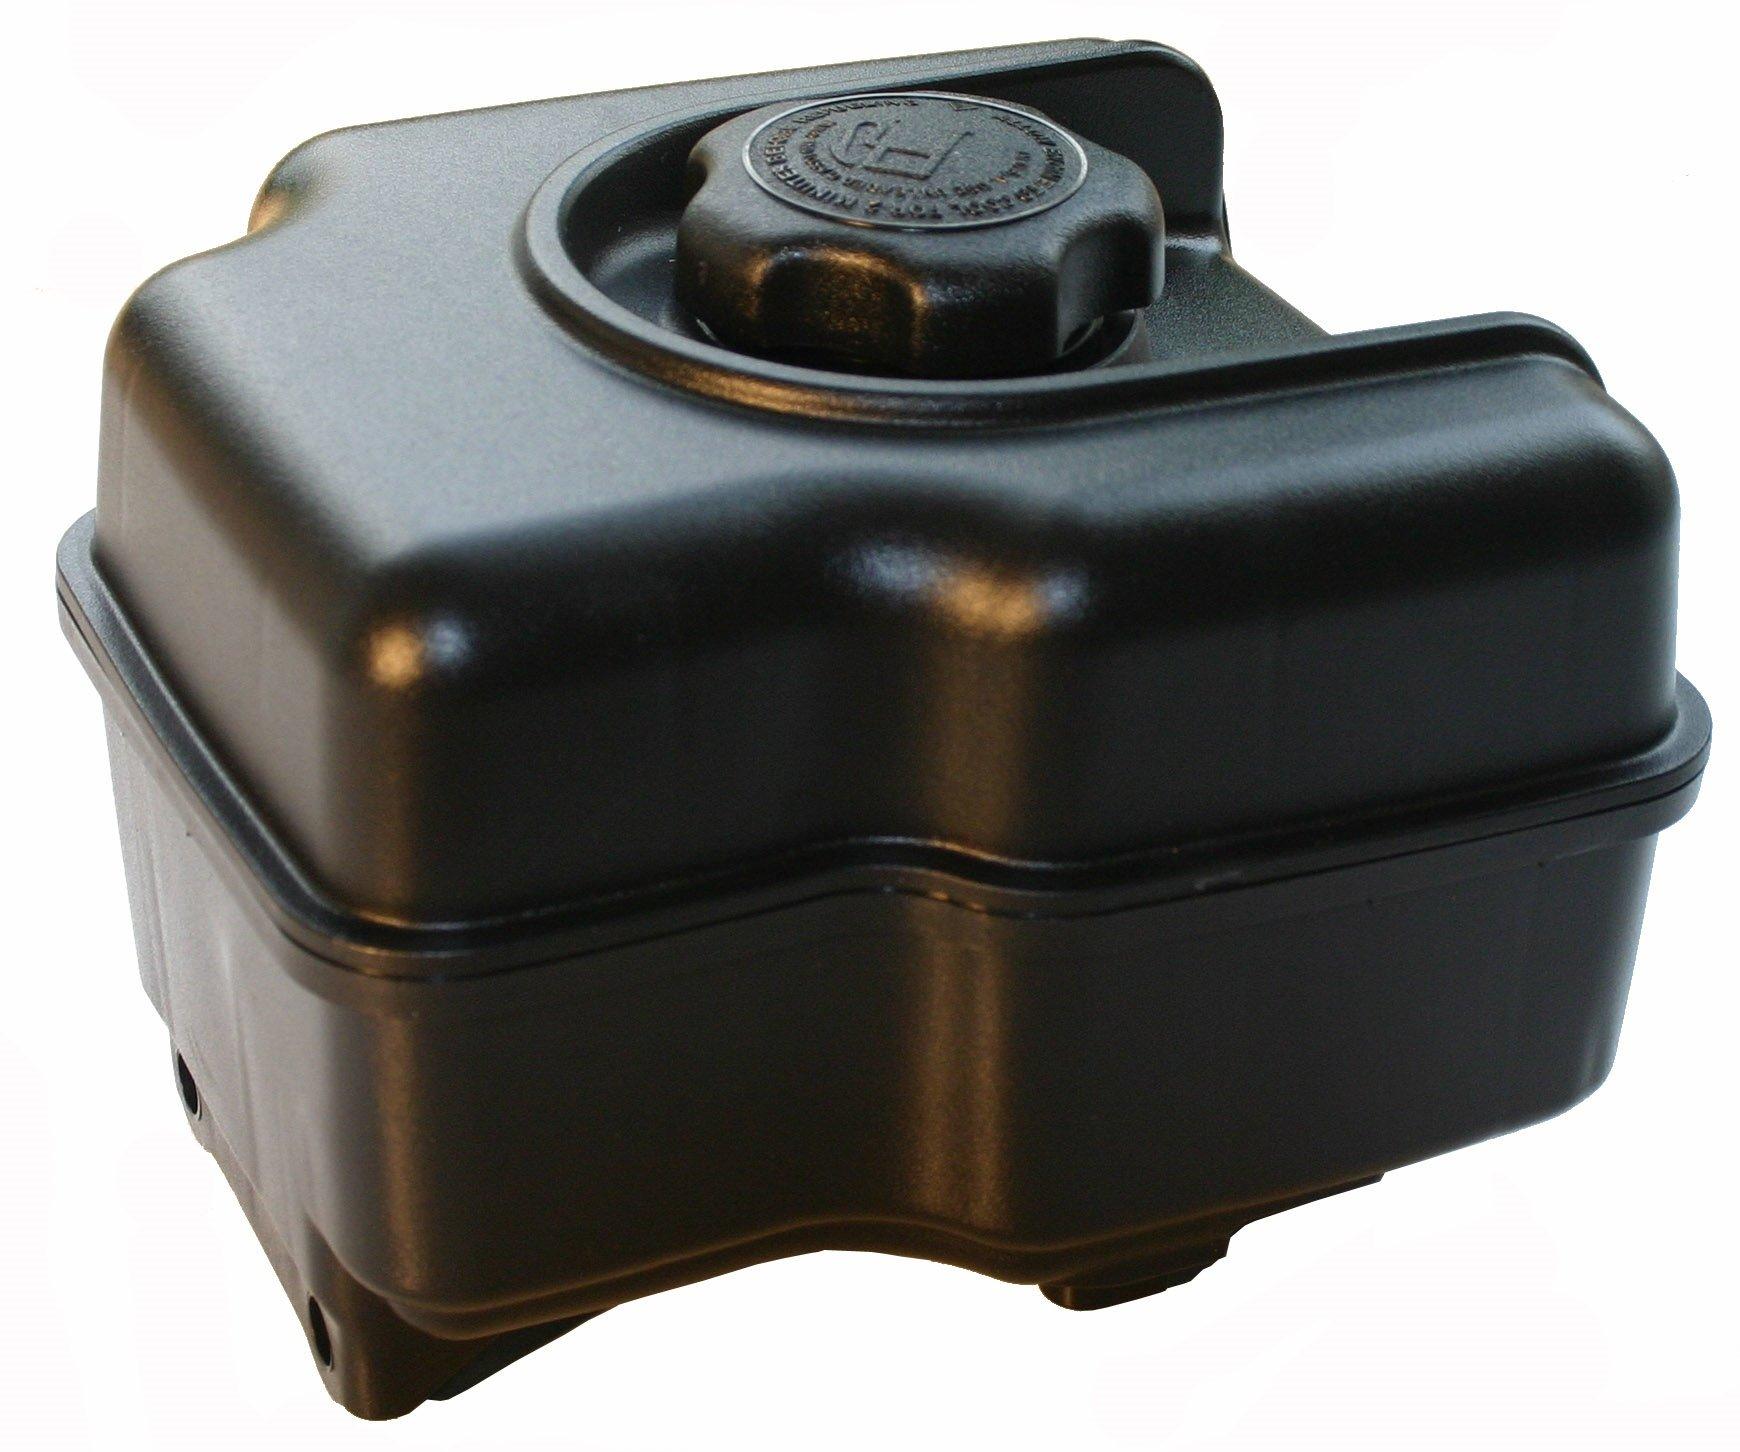 Briggs & Stratton 799863 Fuel Tank Replaces 694260/698110/695736/697779 by Briggs & Stratton